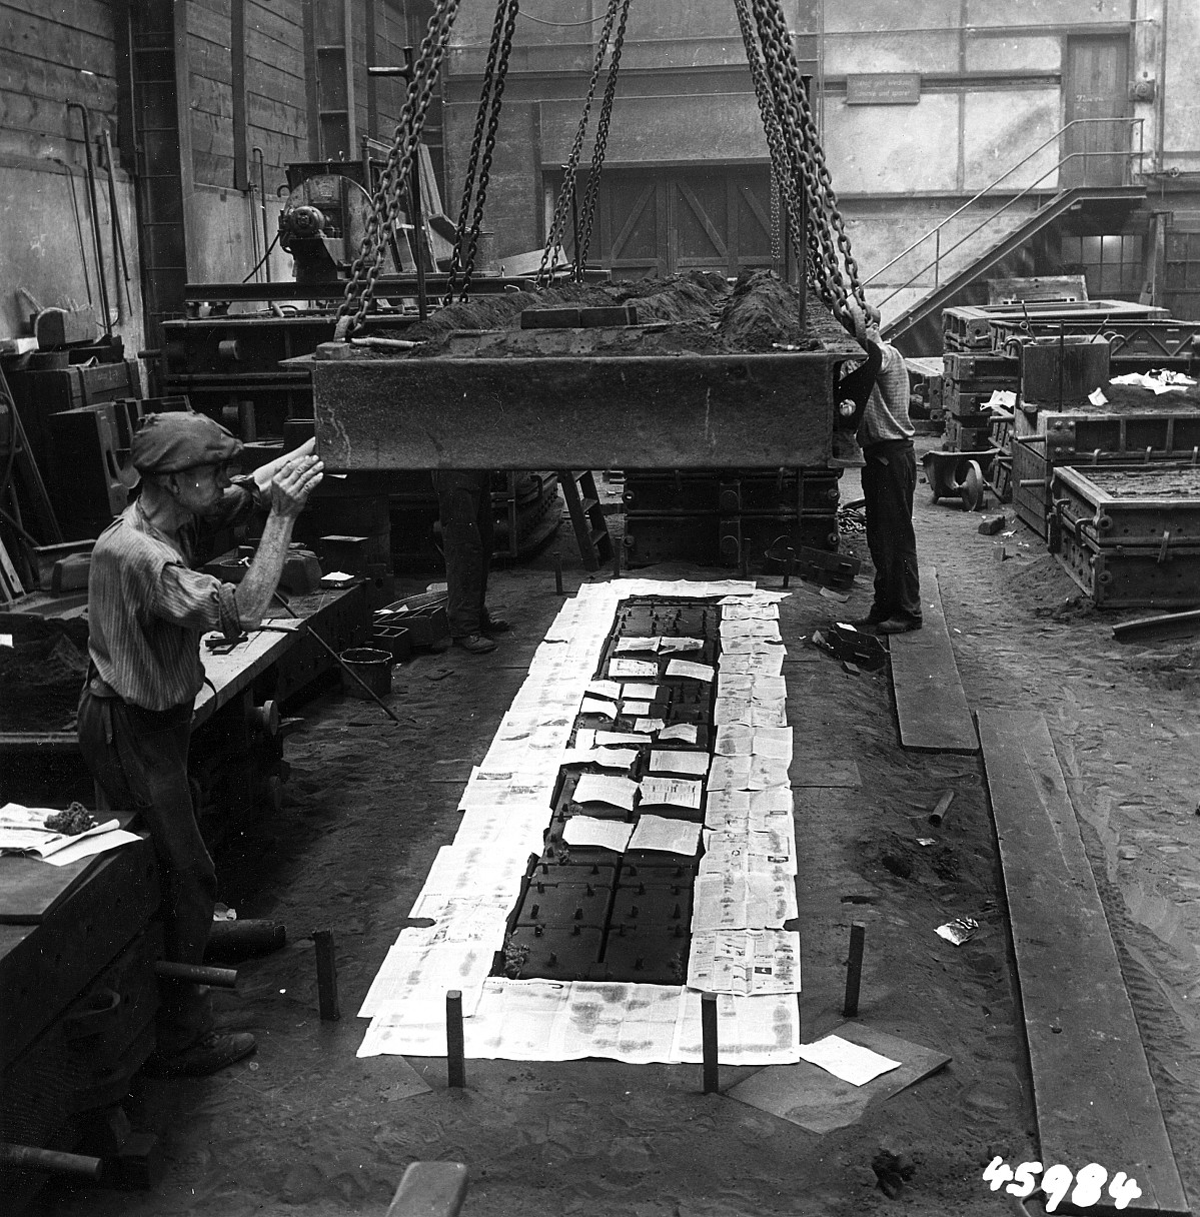 GFA 12/45984: Reportage casting process in malleable casting